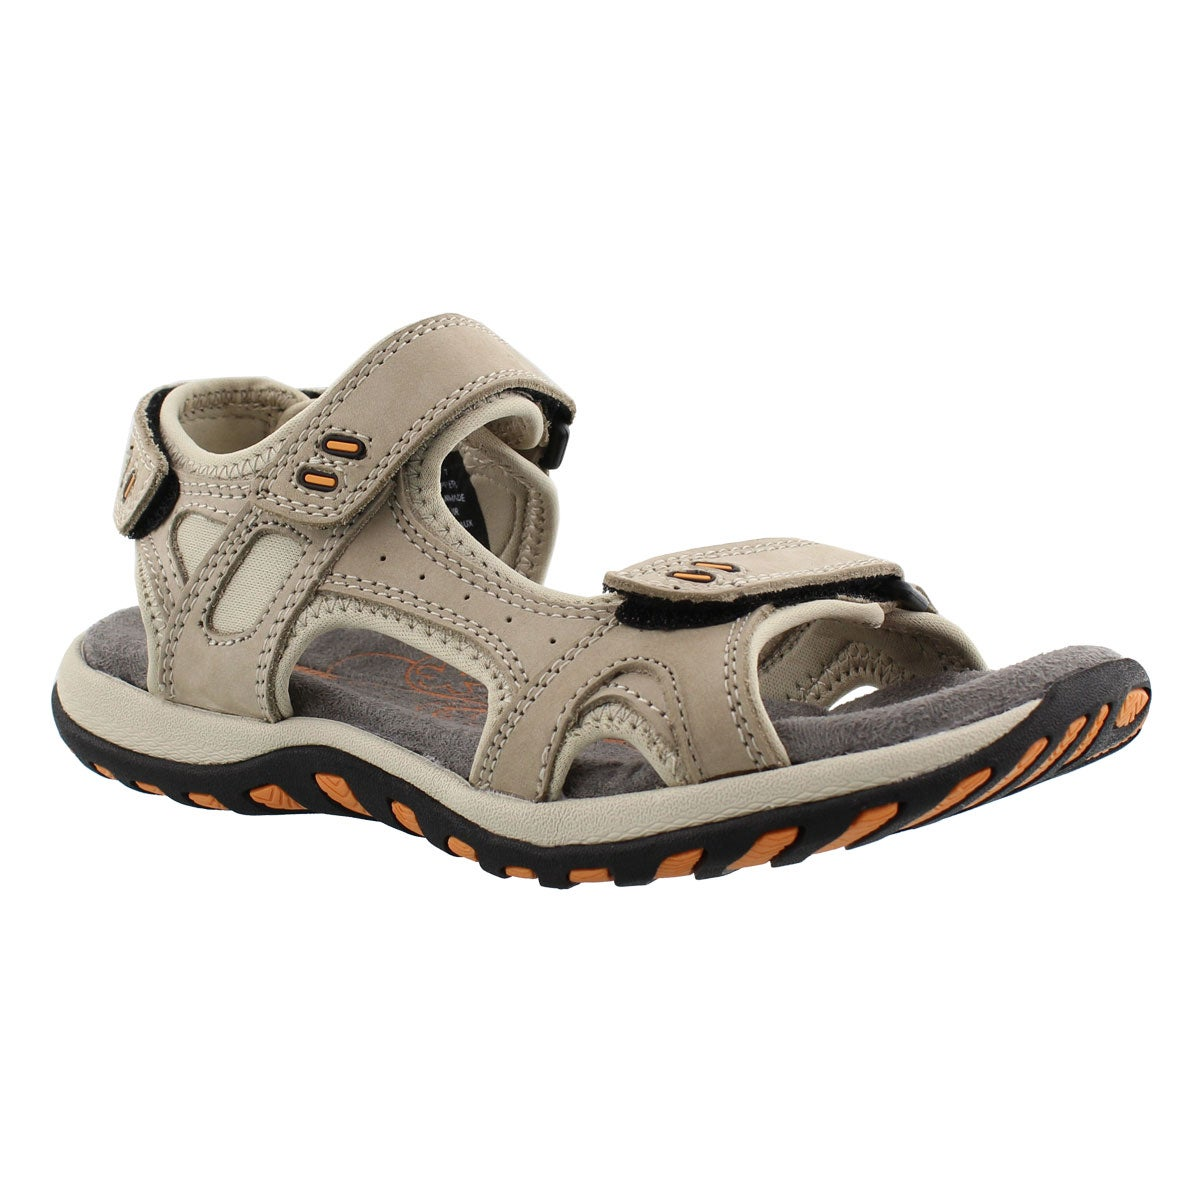 Women's CLARA 2 stone 3 strap sport sandals